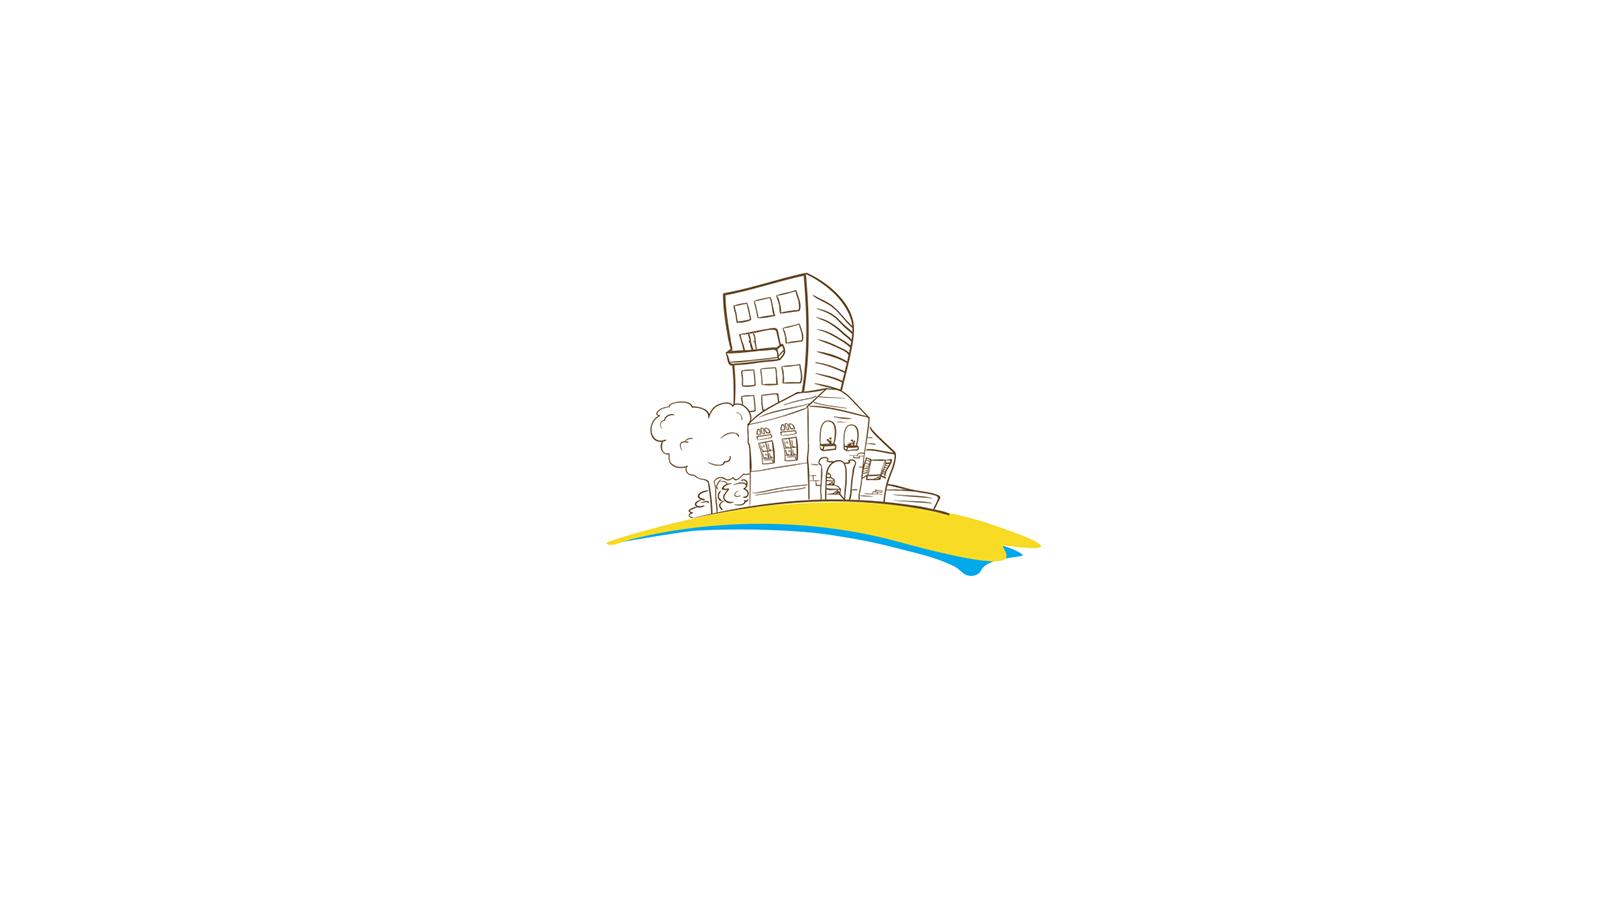 Logo design construction company עיצוב לוגו חברה קבלנית